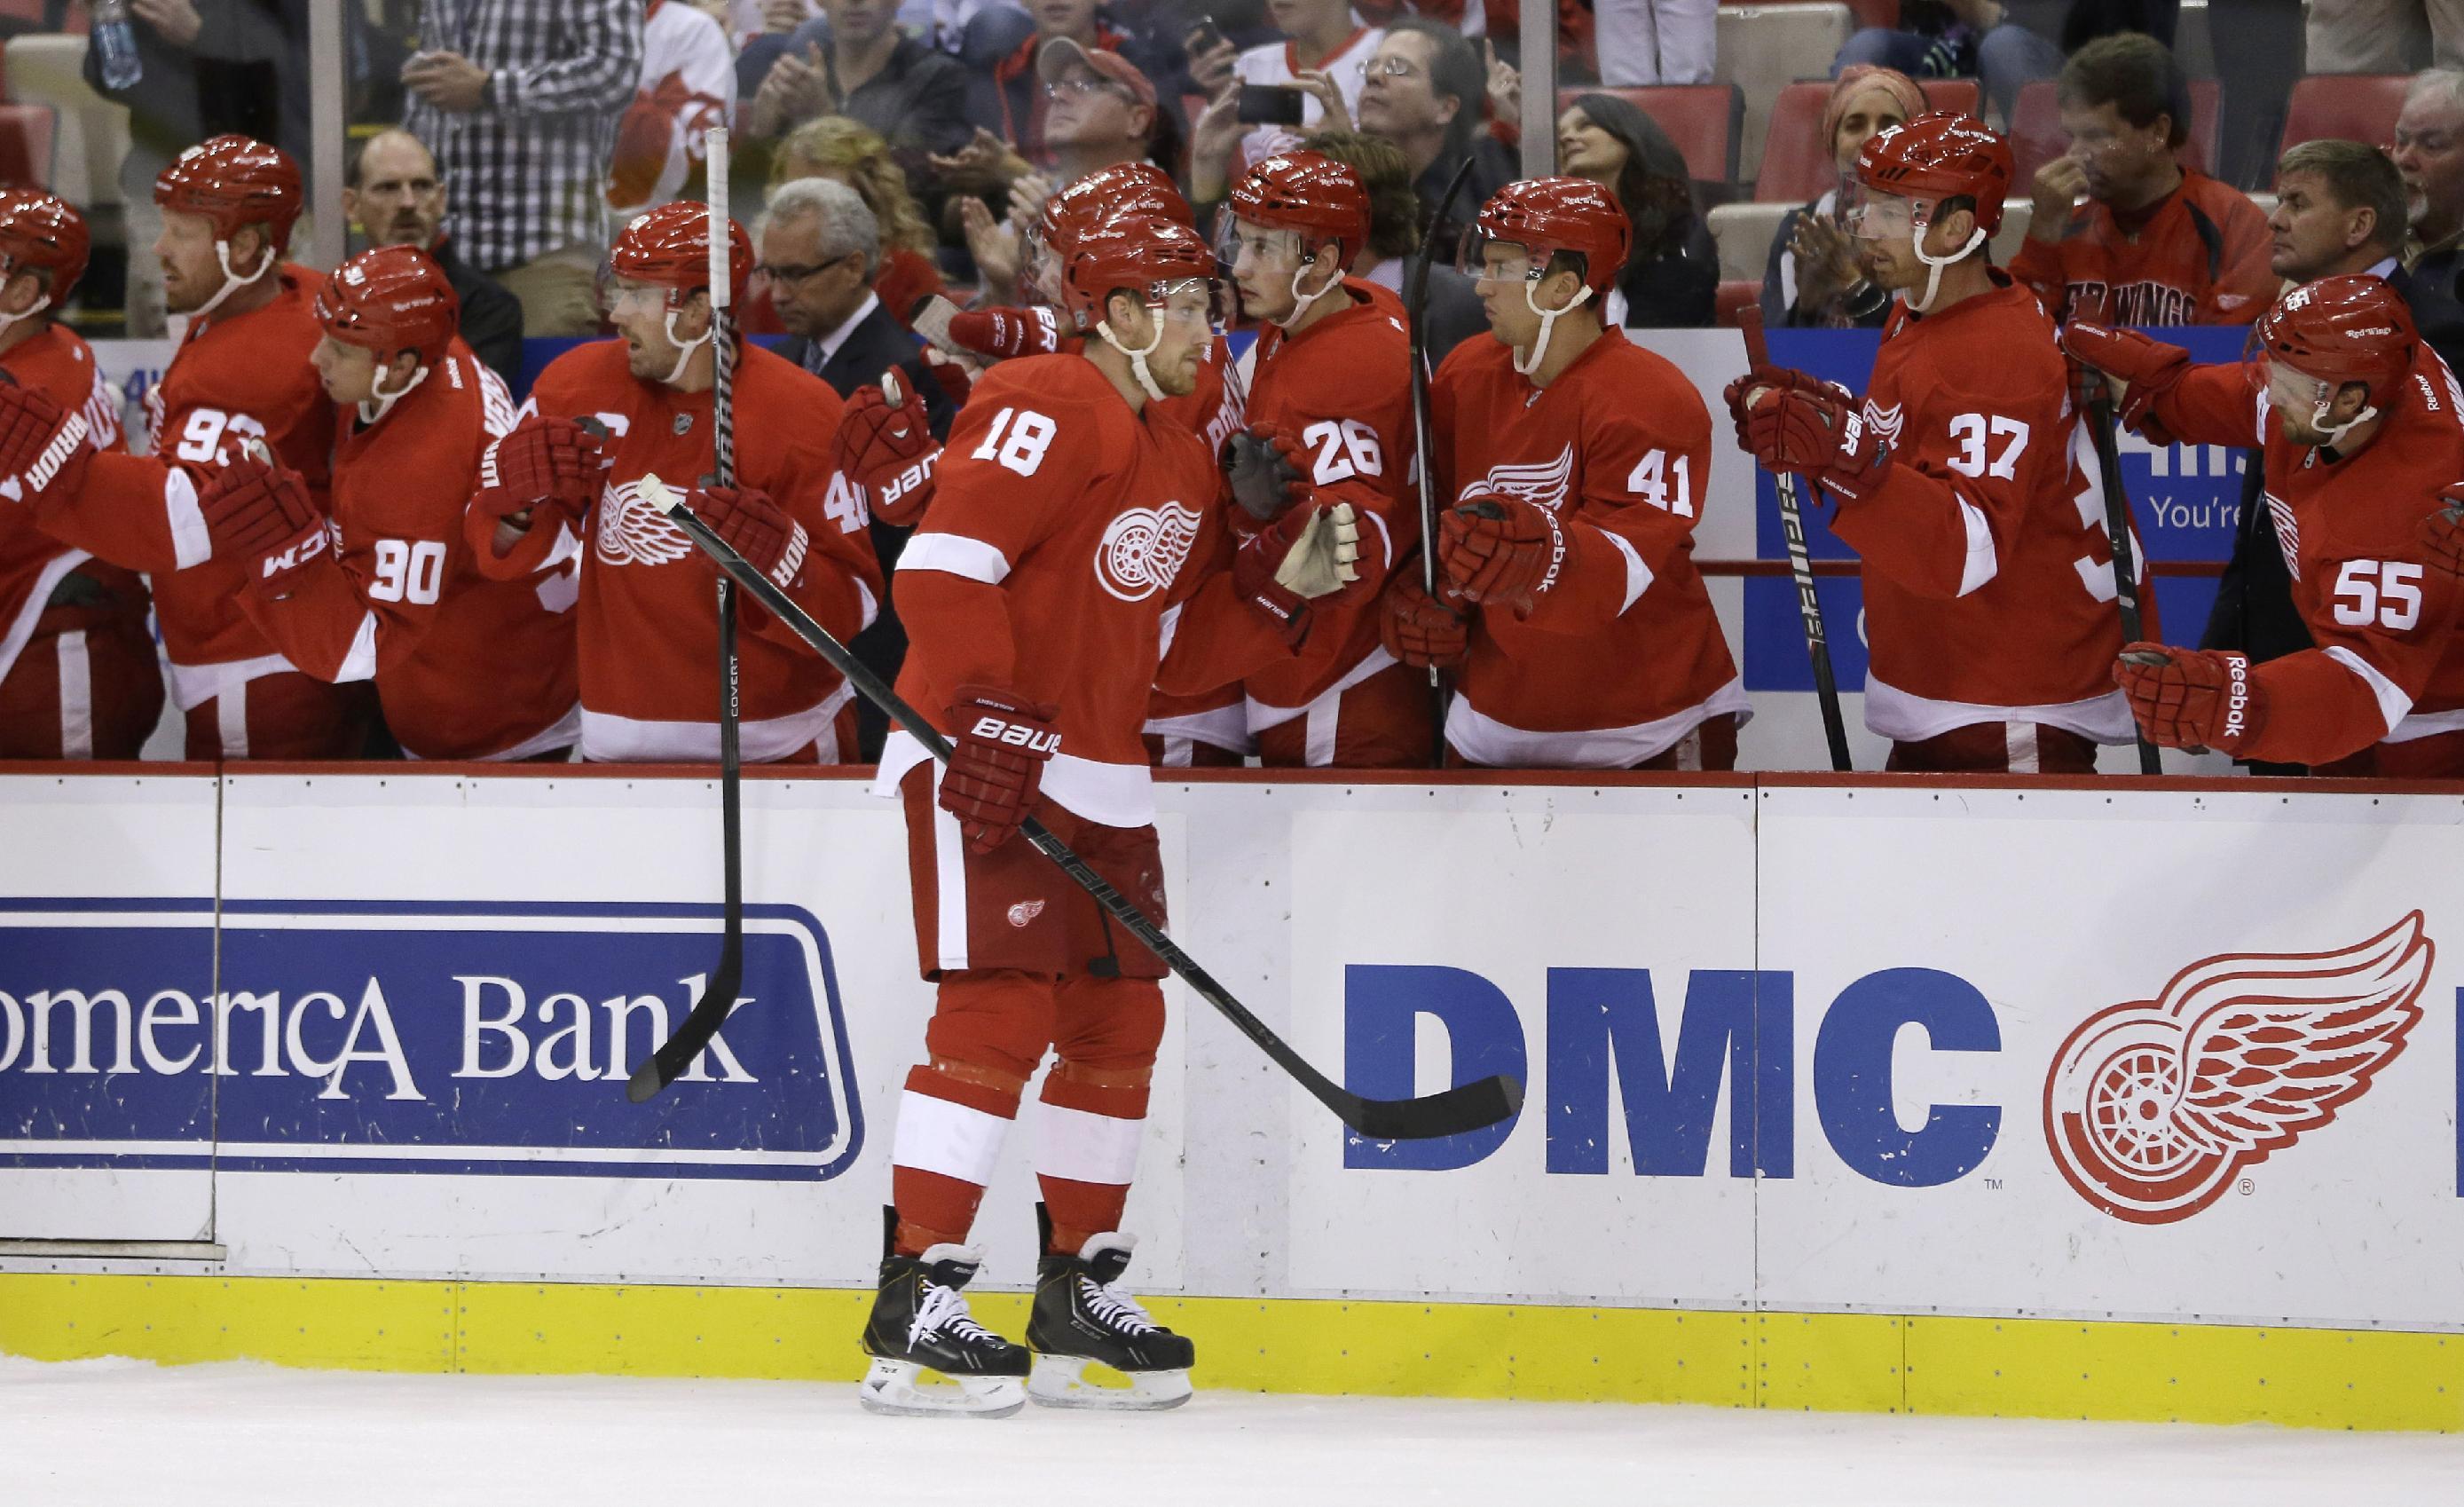 Red Wings beat Maple Leafs 5-2 in preseason